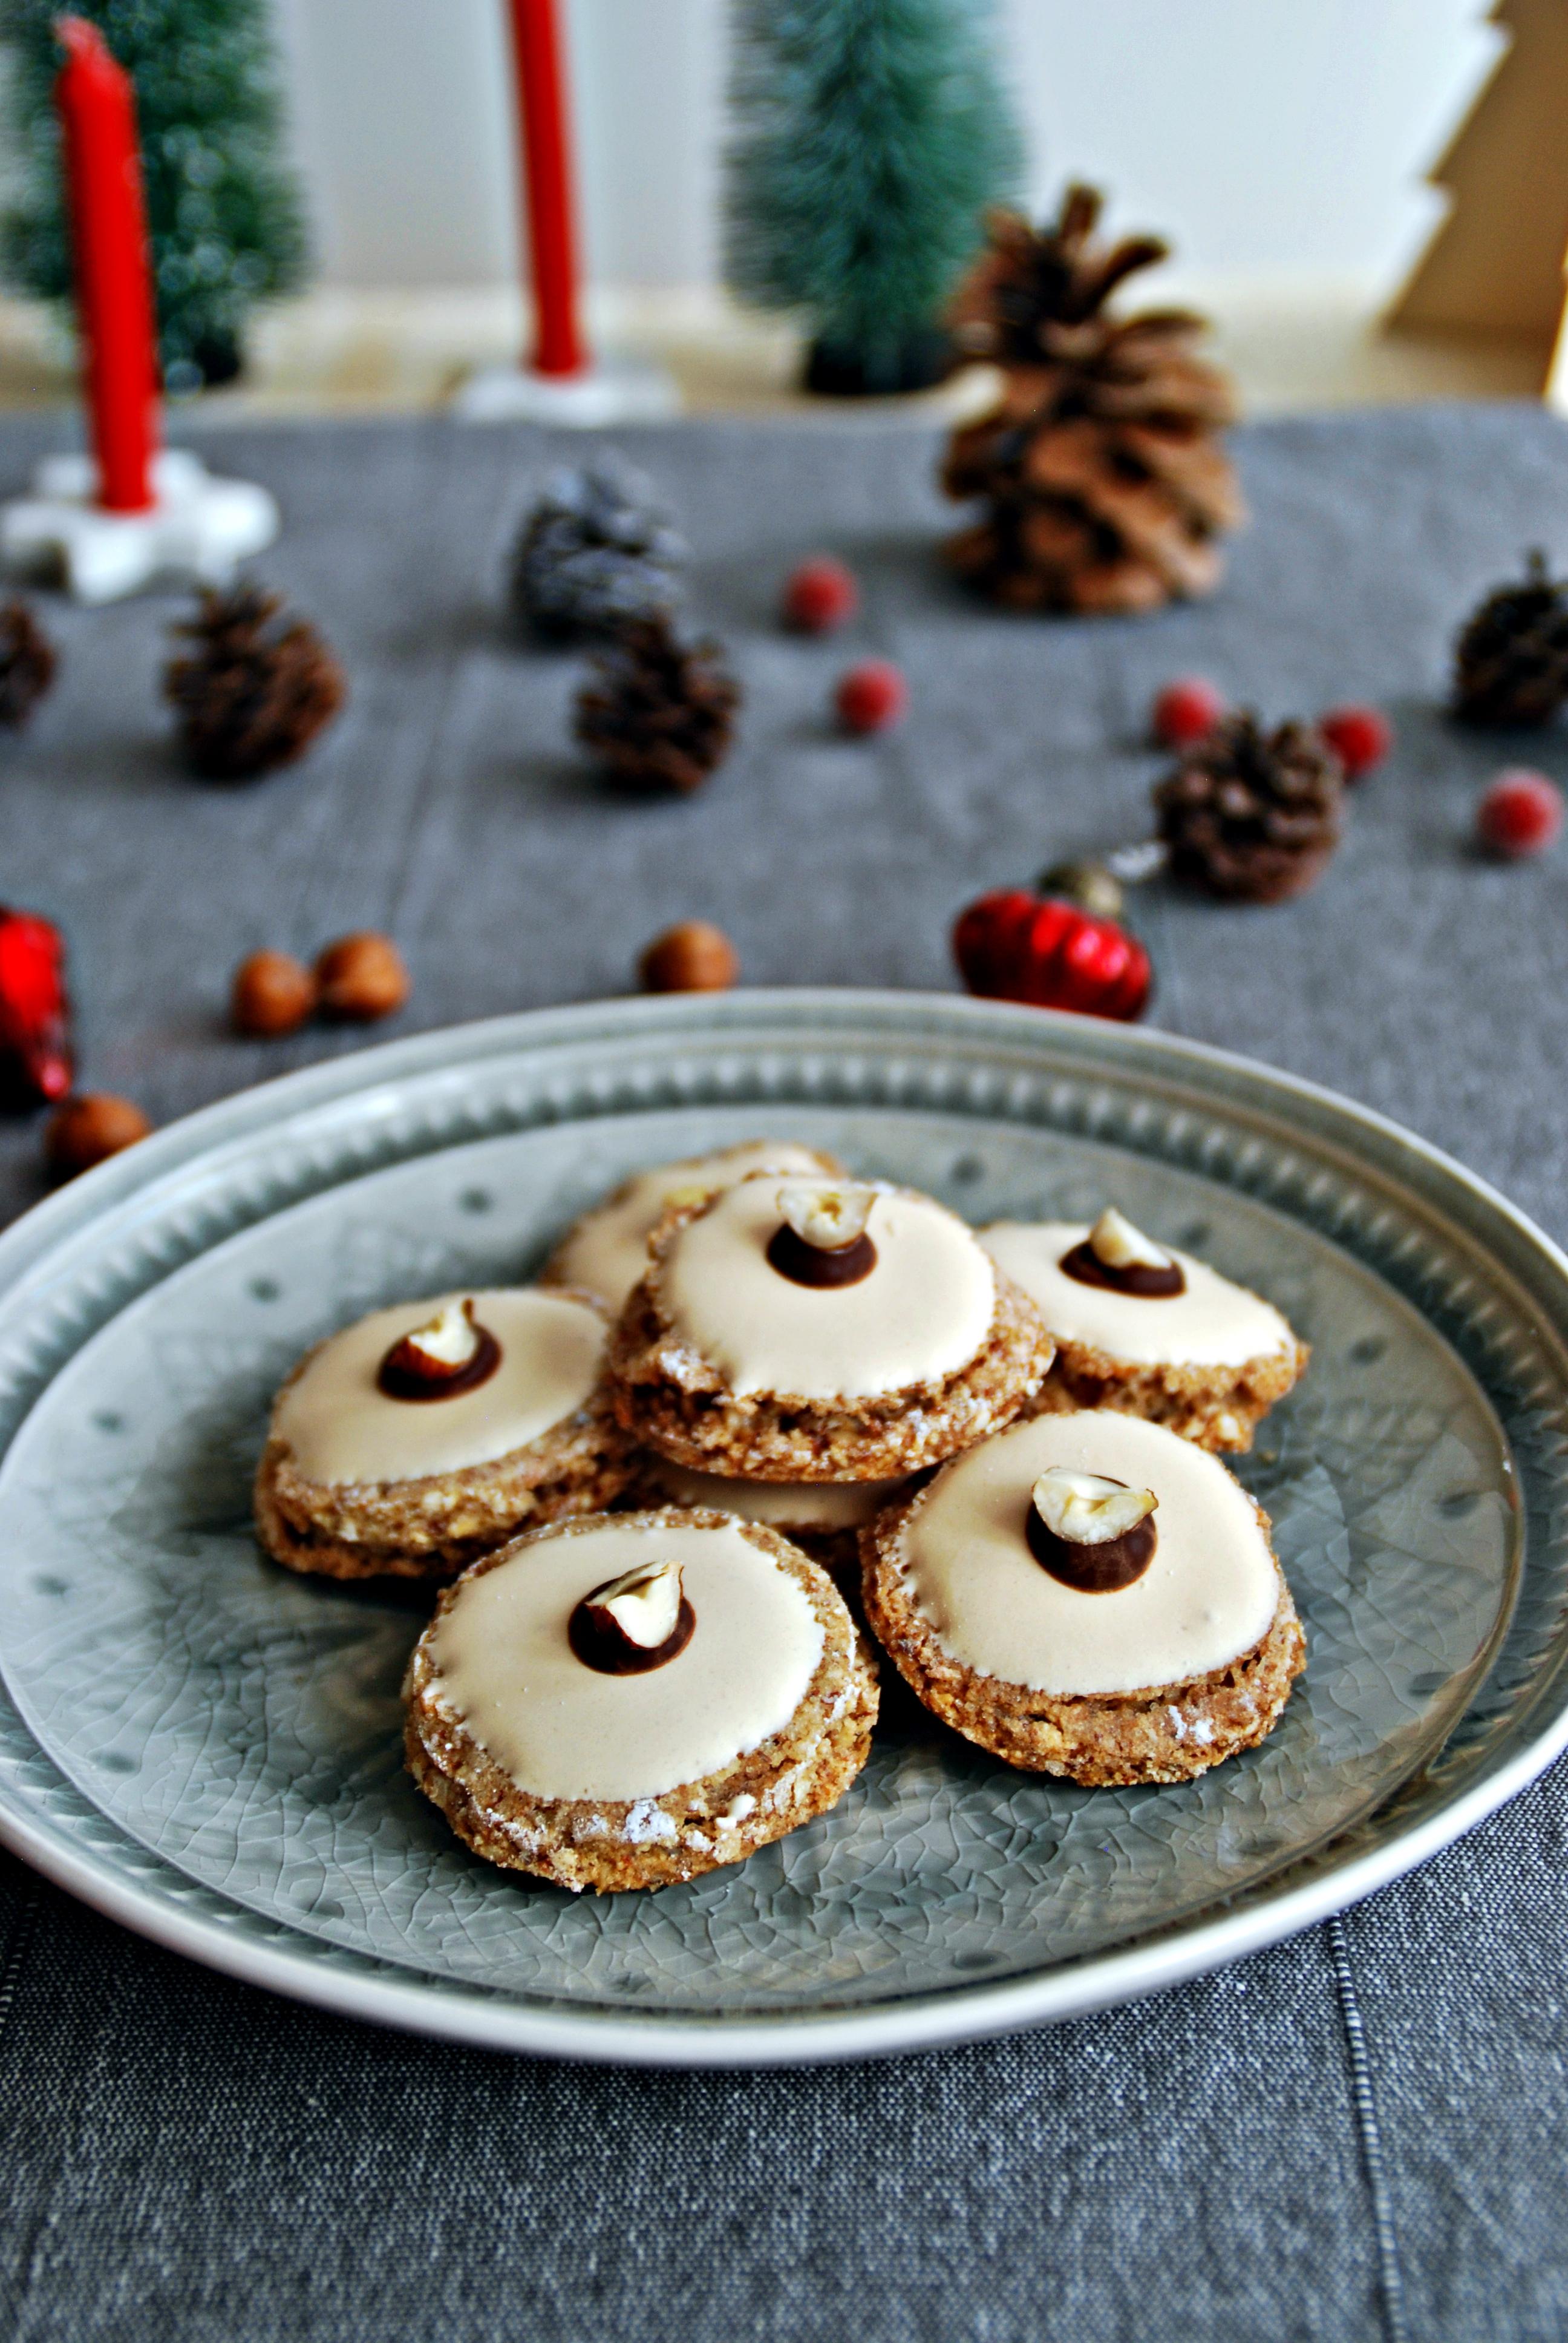 nuss taler weihnachtskekse kekse sch rzenfr ulein. Black Bedroom Furniture Sets. Home Design Ideas